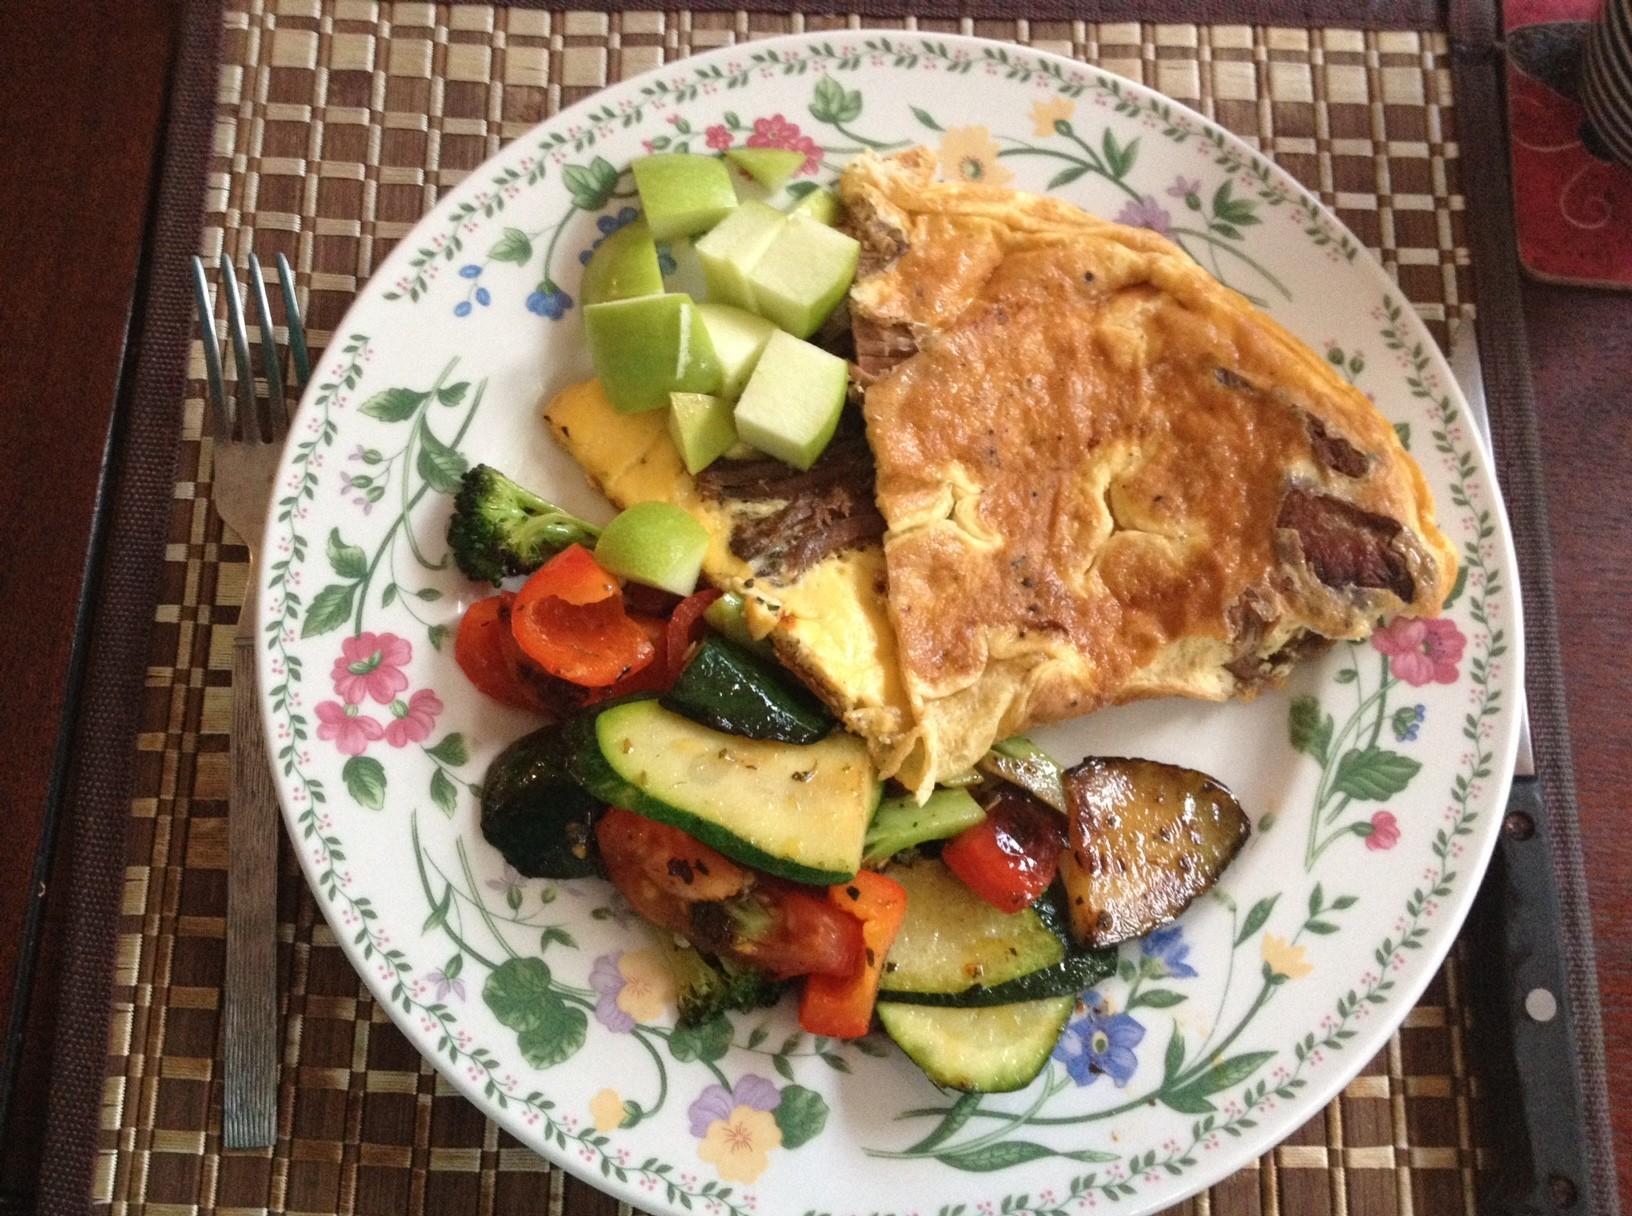 Breakfast: 3 eggs, slow cooked1632